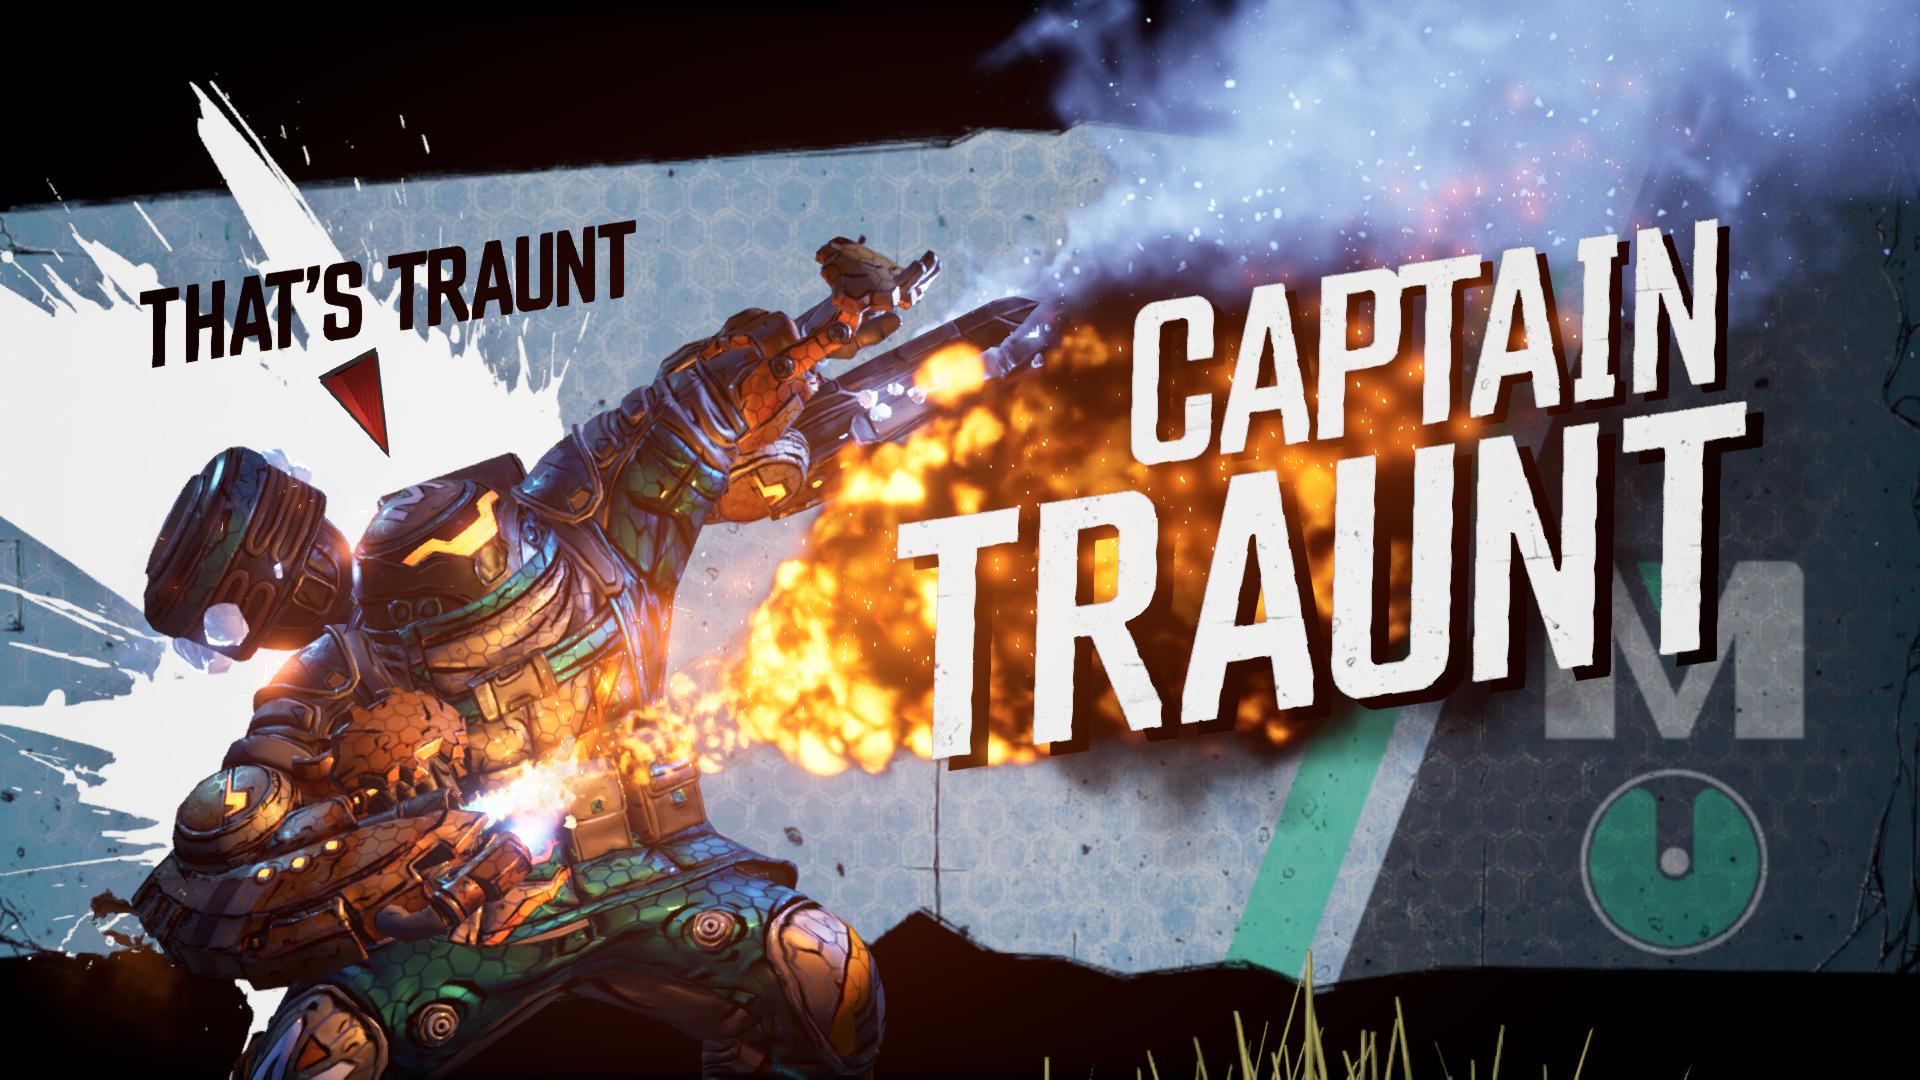 Captain Traunt